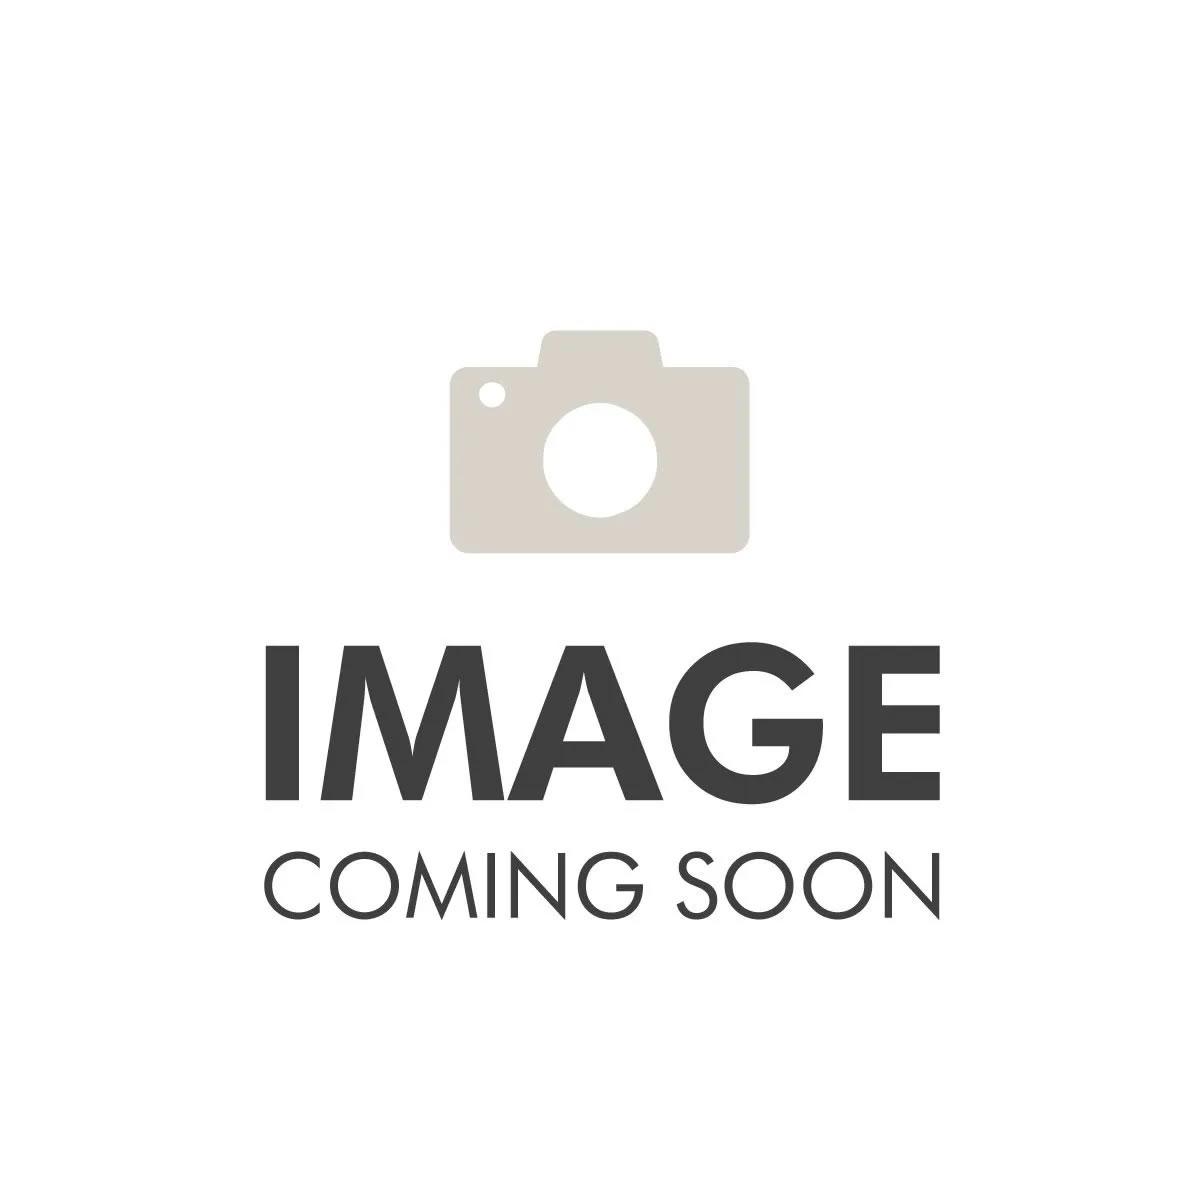 Island Topper, Khaki Diamond; 07-09 Jeep Wrangler JK